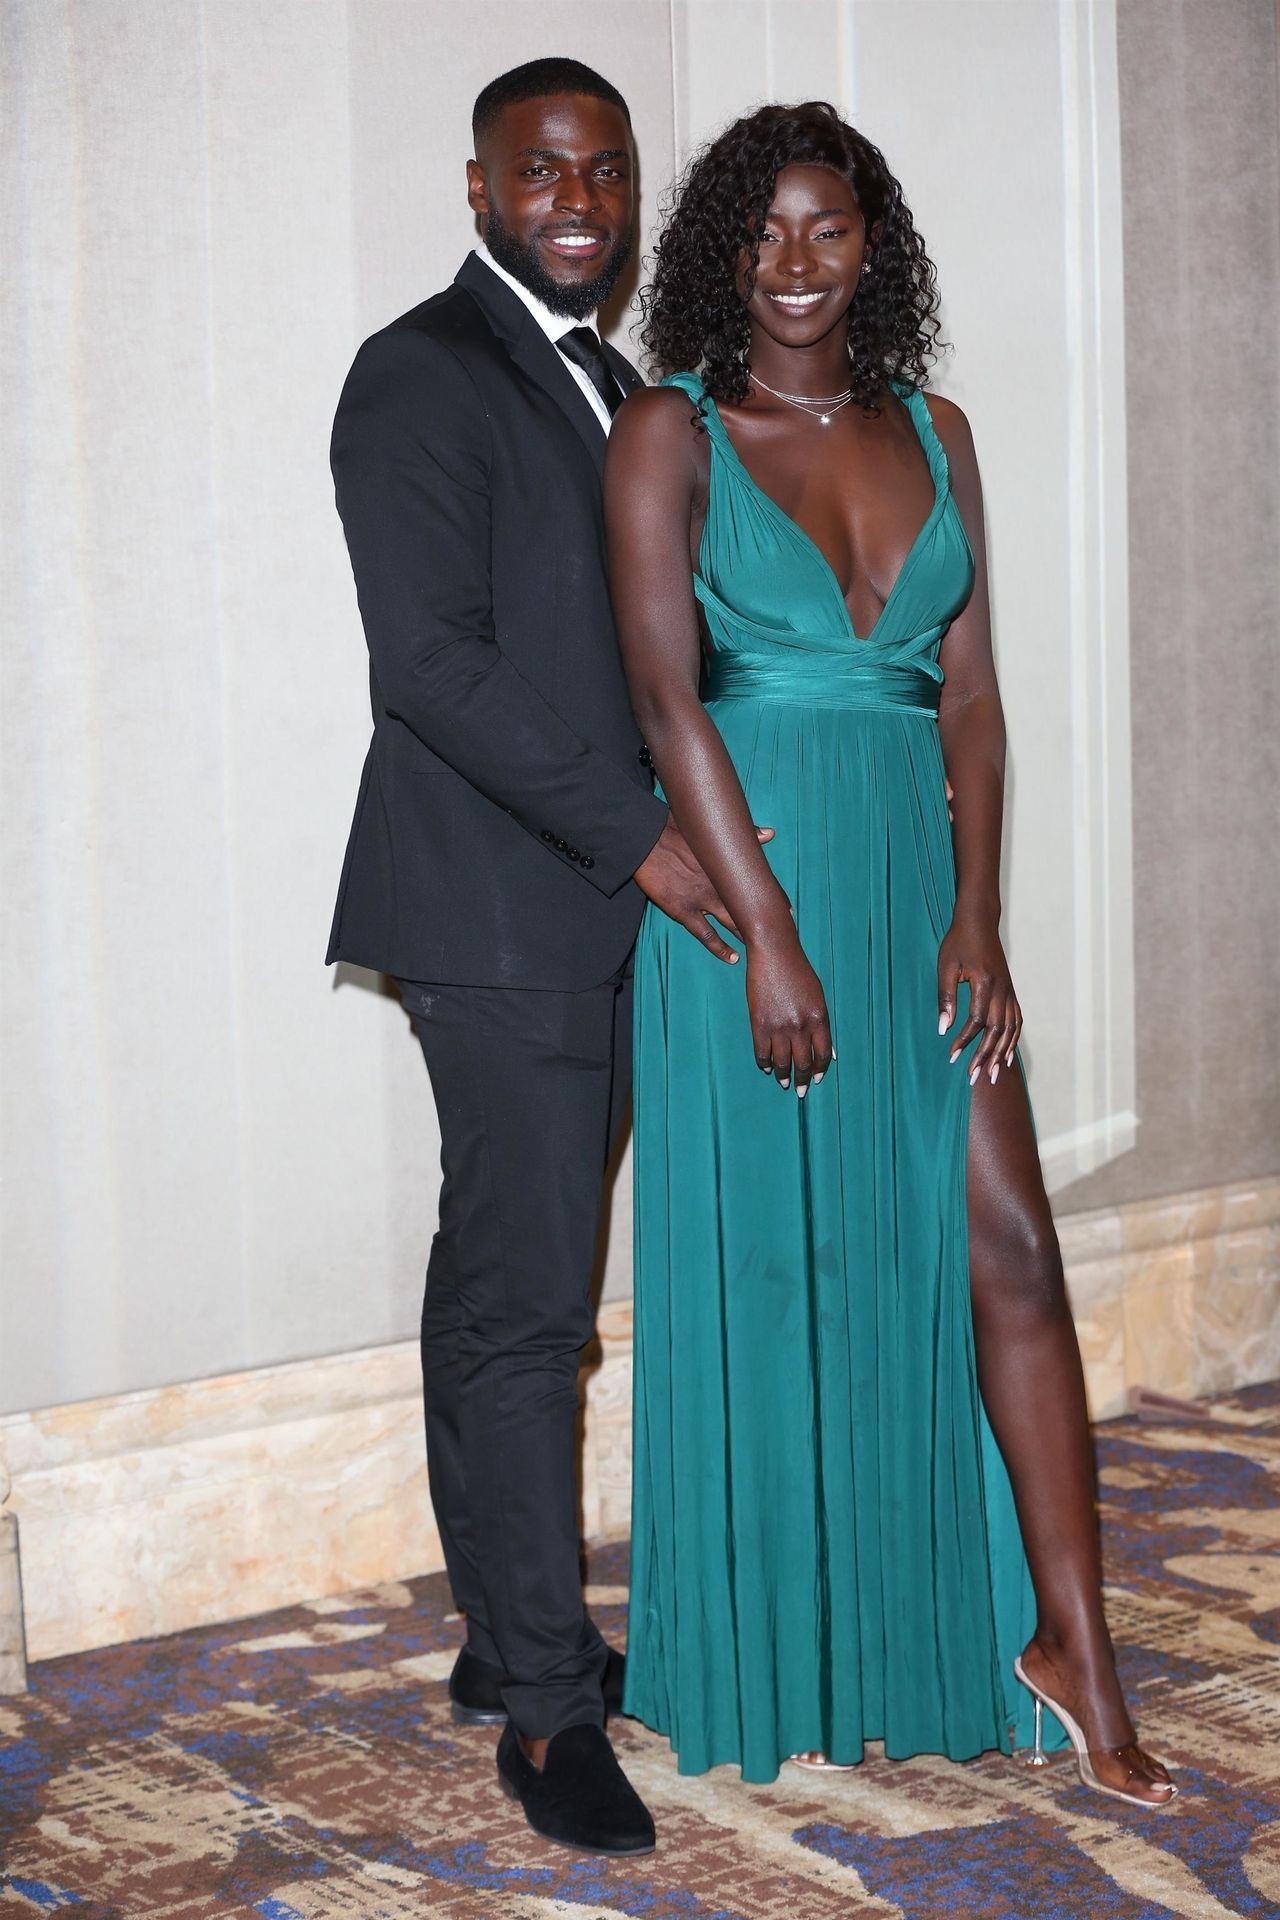 Mike Boateng & Priscilla Anyabu Are Seen At British Ethnic Diversity Sports Awards 0135